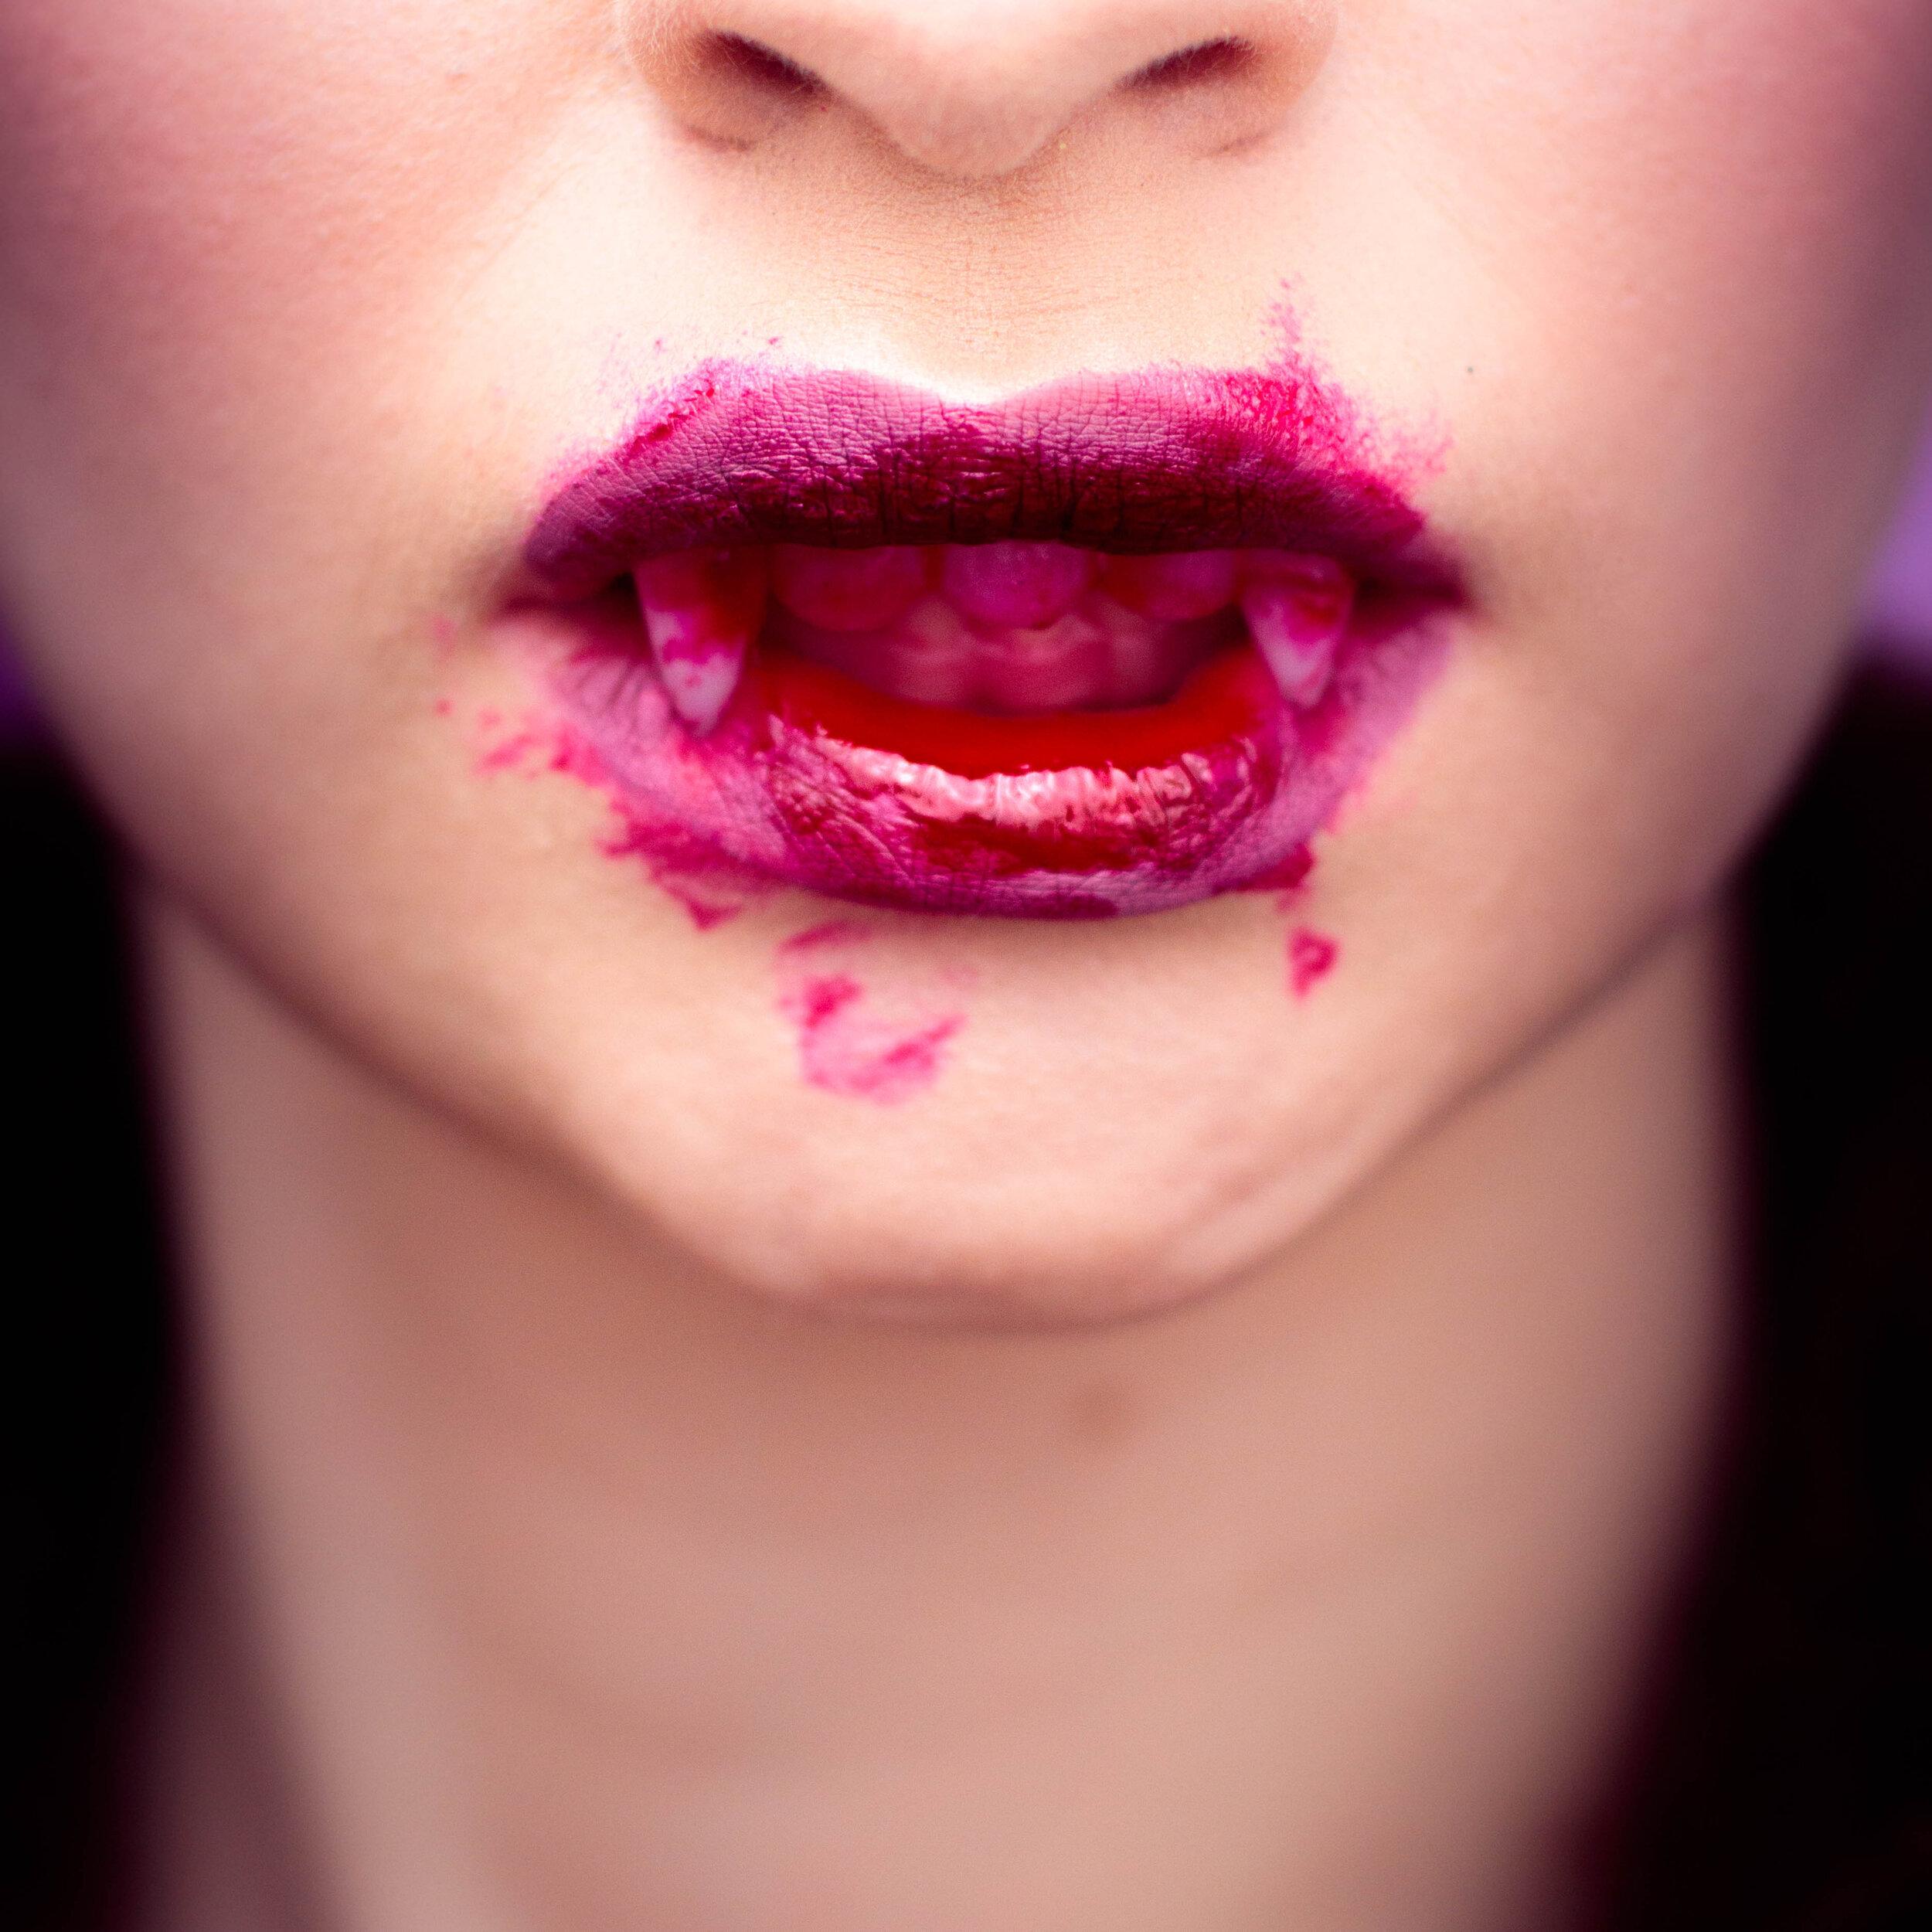 vintage-vampire-halloween-makeup-pauuulette-close-up-1.jpg